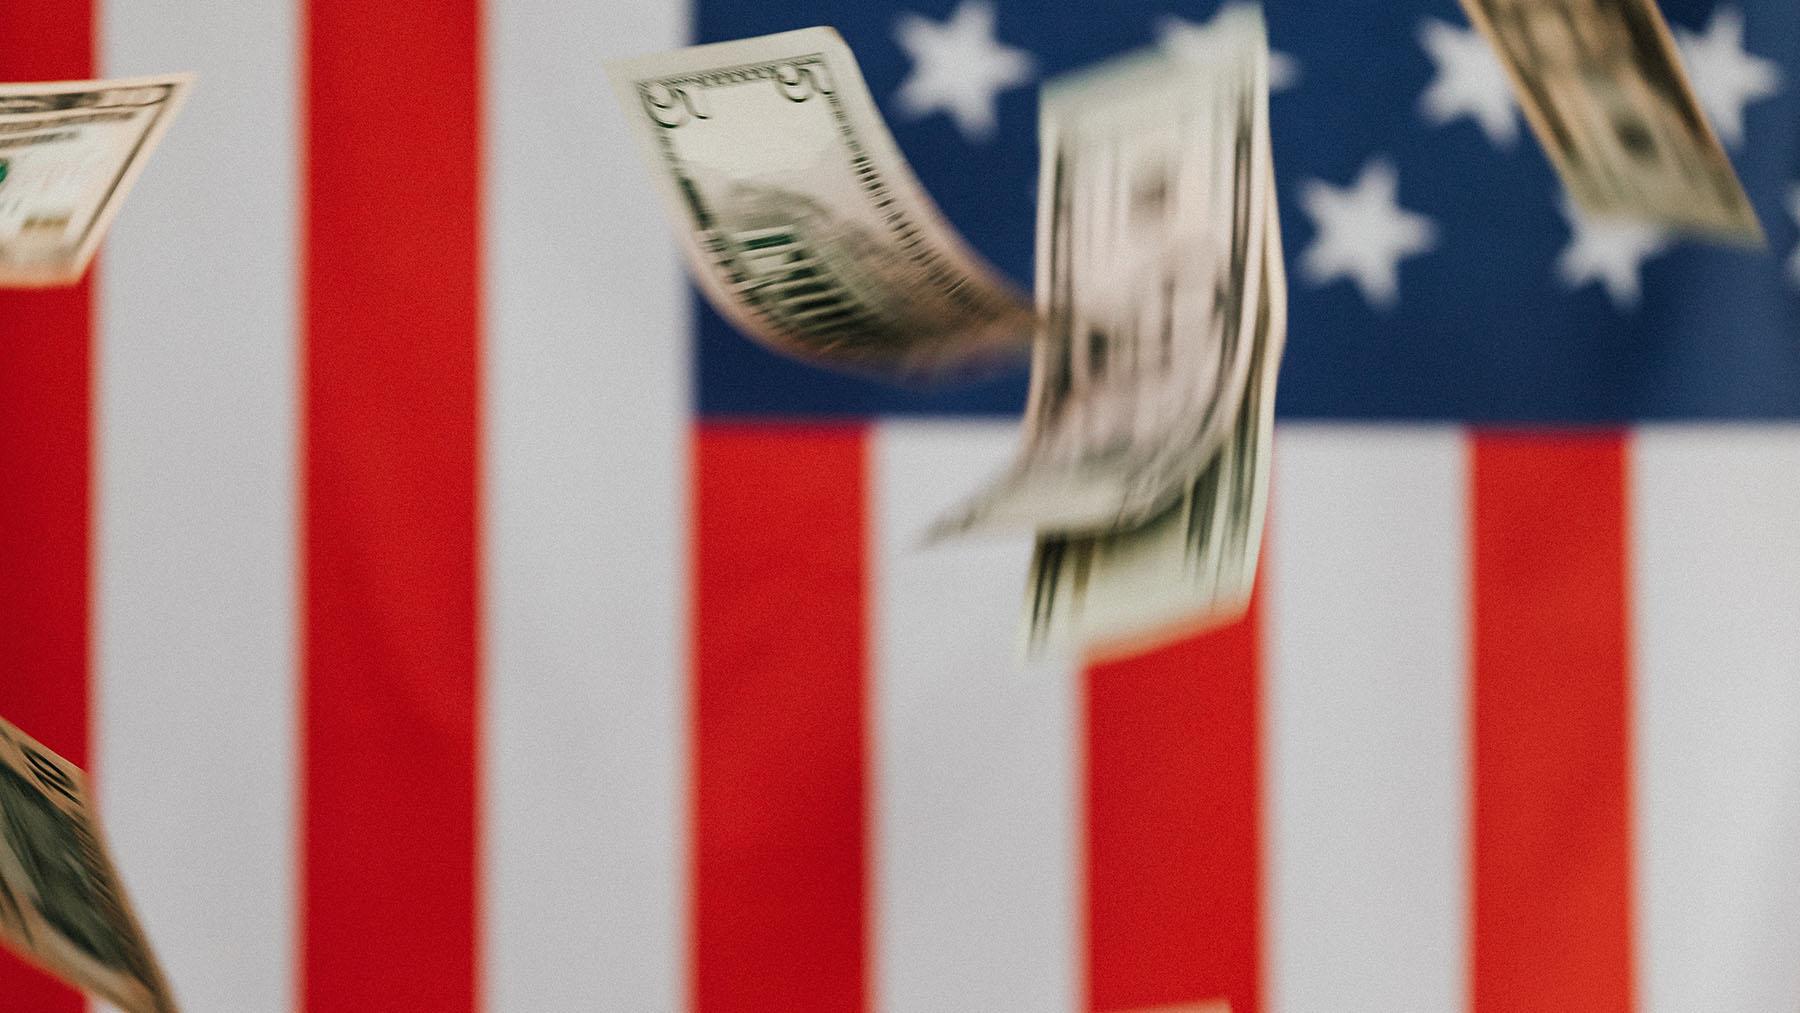 Kalender ekonomi live memantau seluruh peristiwa penting dan indikator ekonomi yang menggerakkan pasar. Inflasi dan Deflasi Manakah yang Lebih Baik? - Panduan Trading